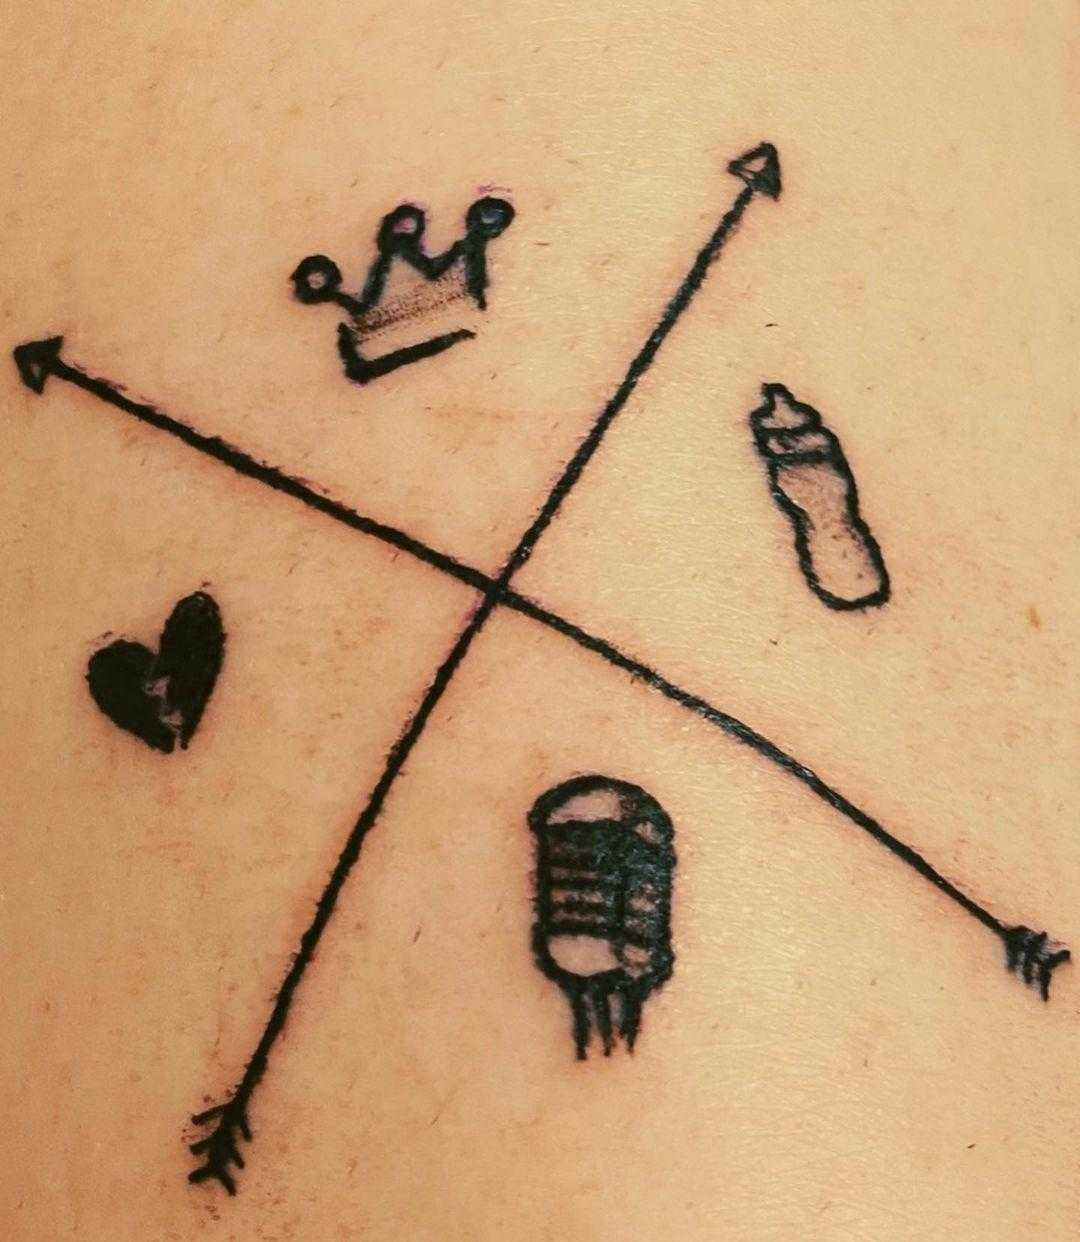 Imagem mostra tatuagem